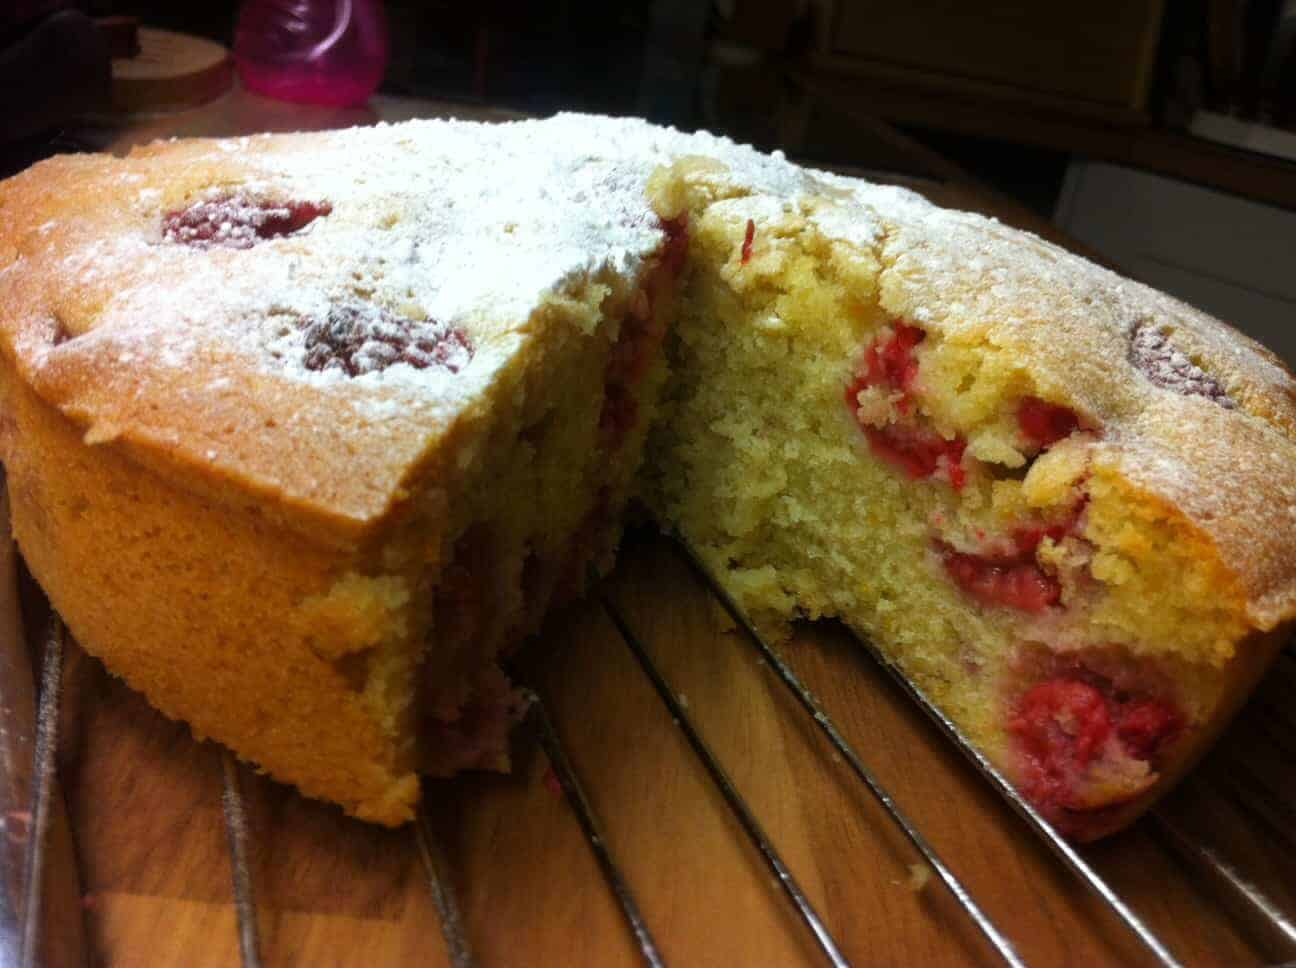 Raspberry and Almond Madeira Cake